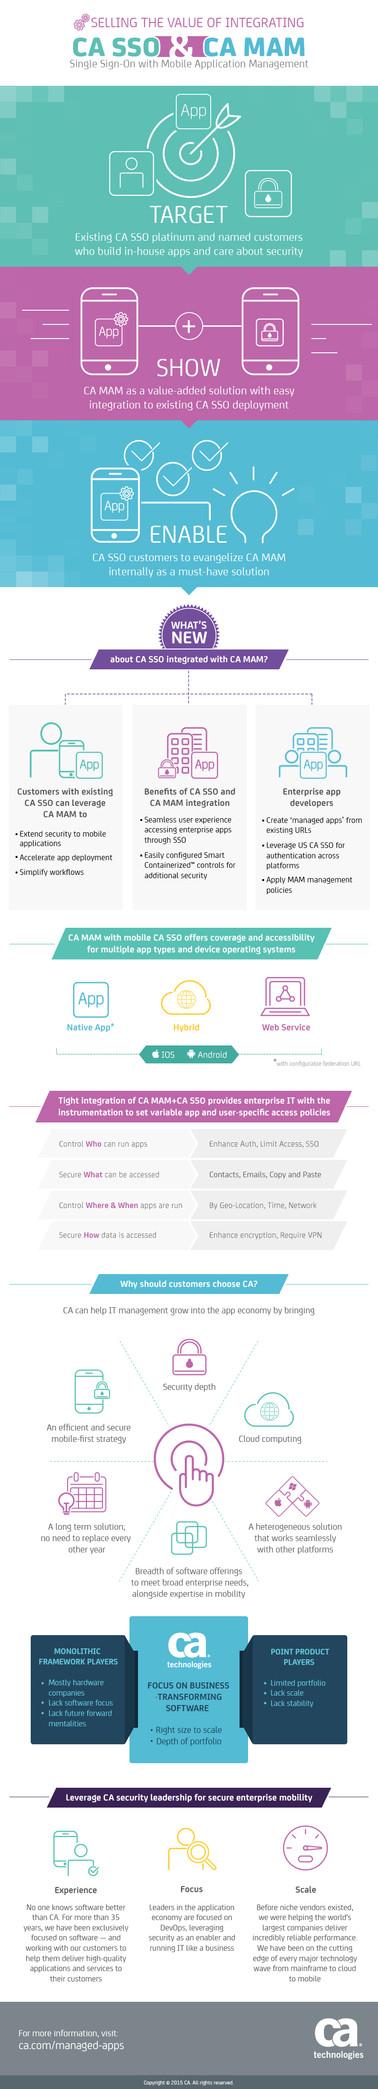 infographic_CA_internal_011615.jpg